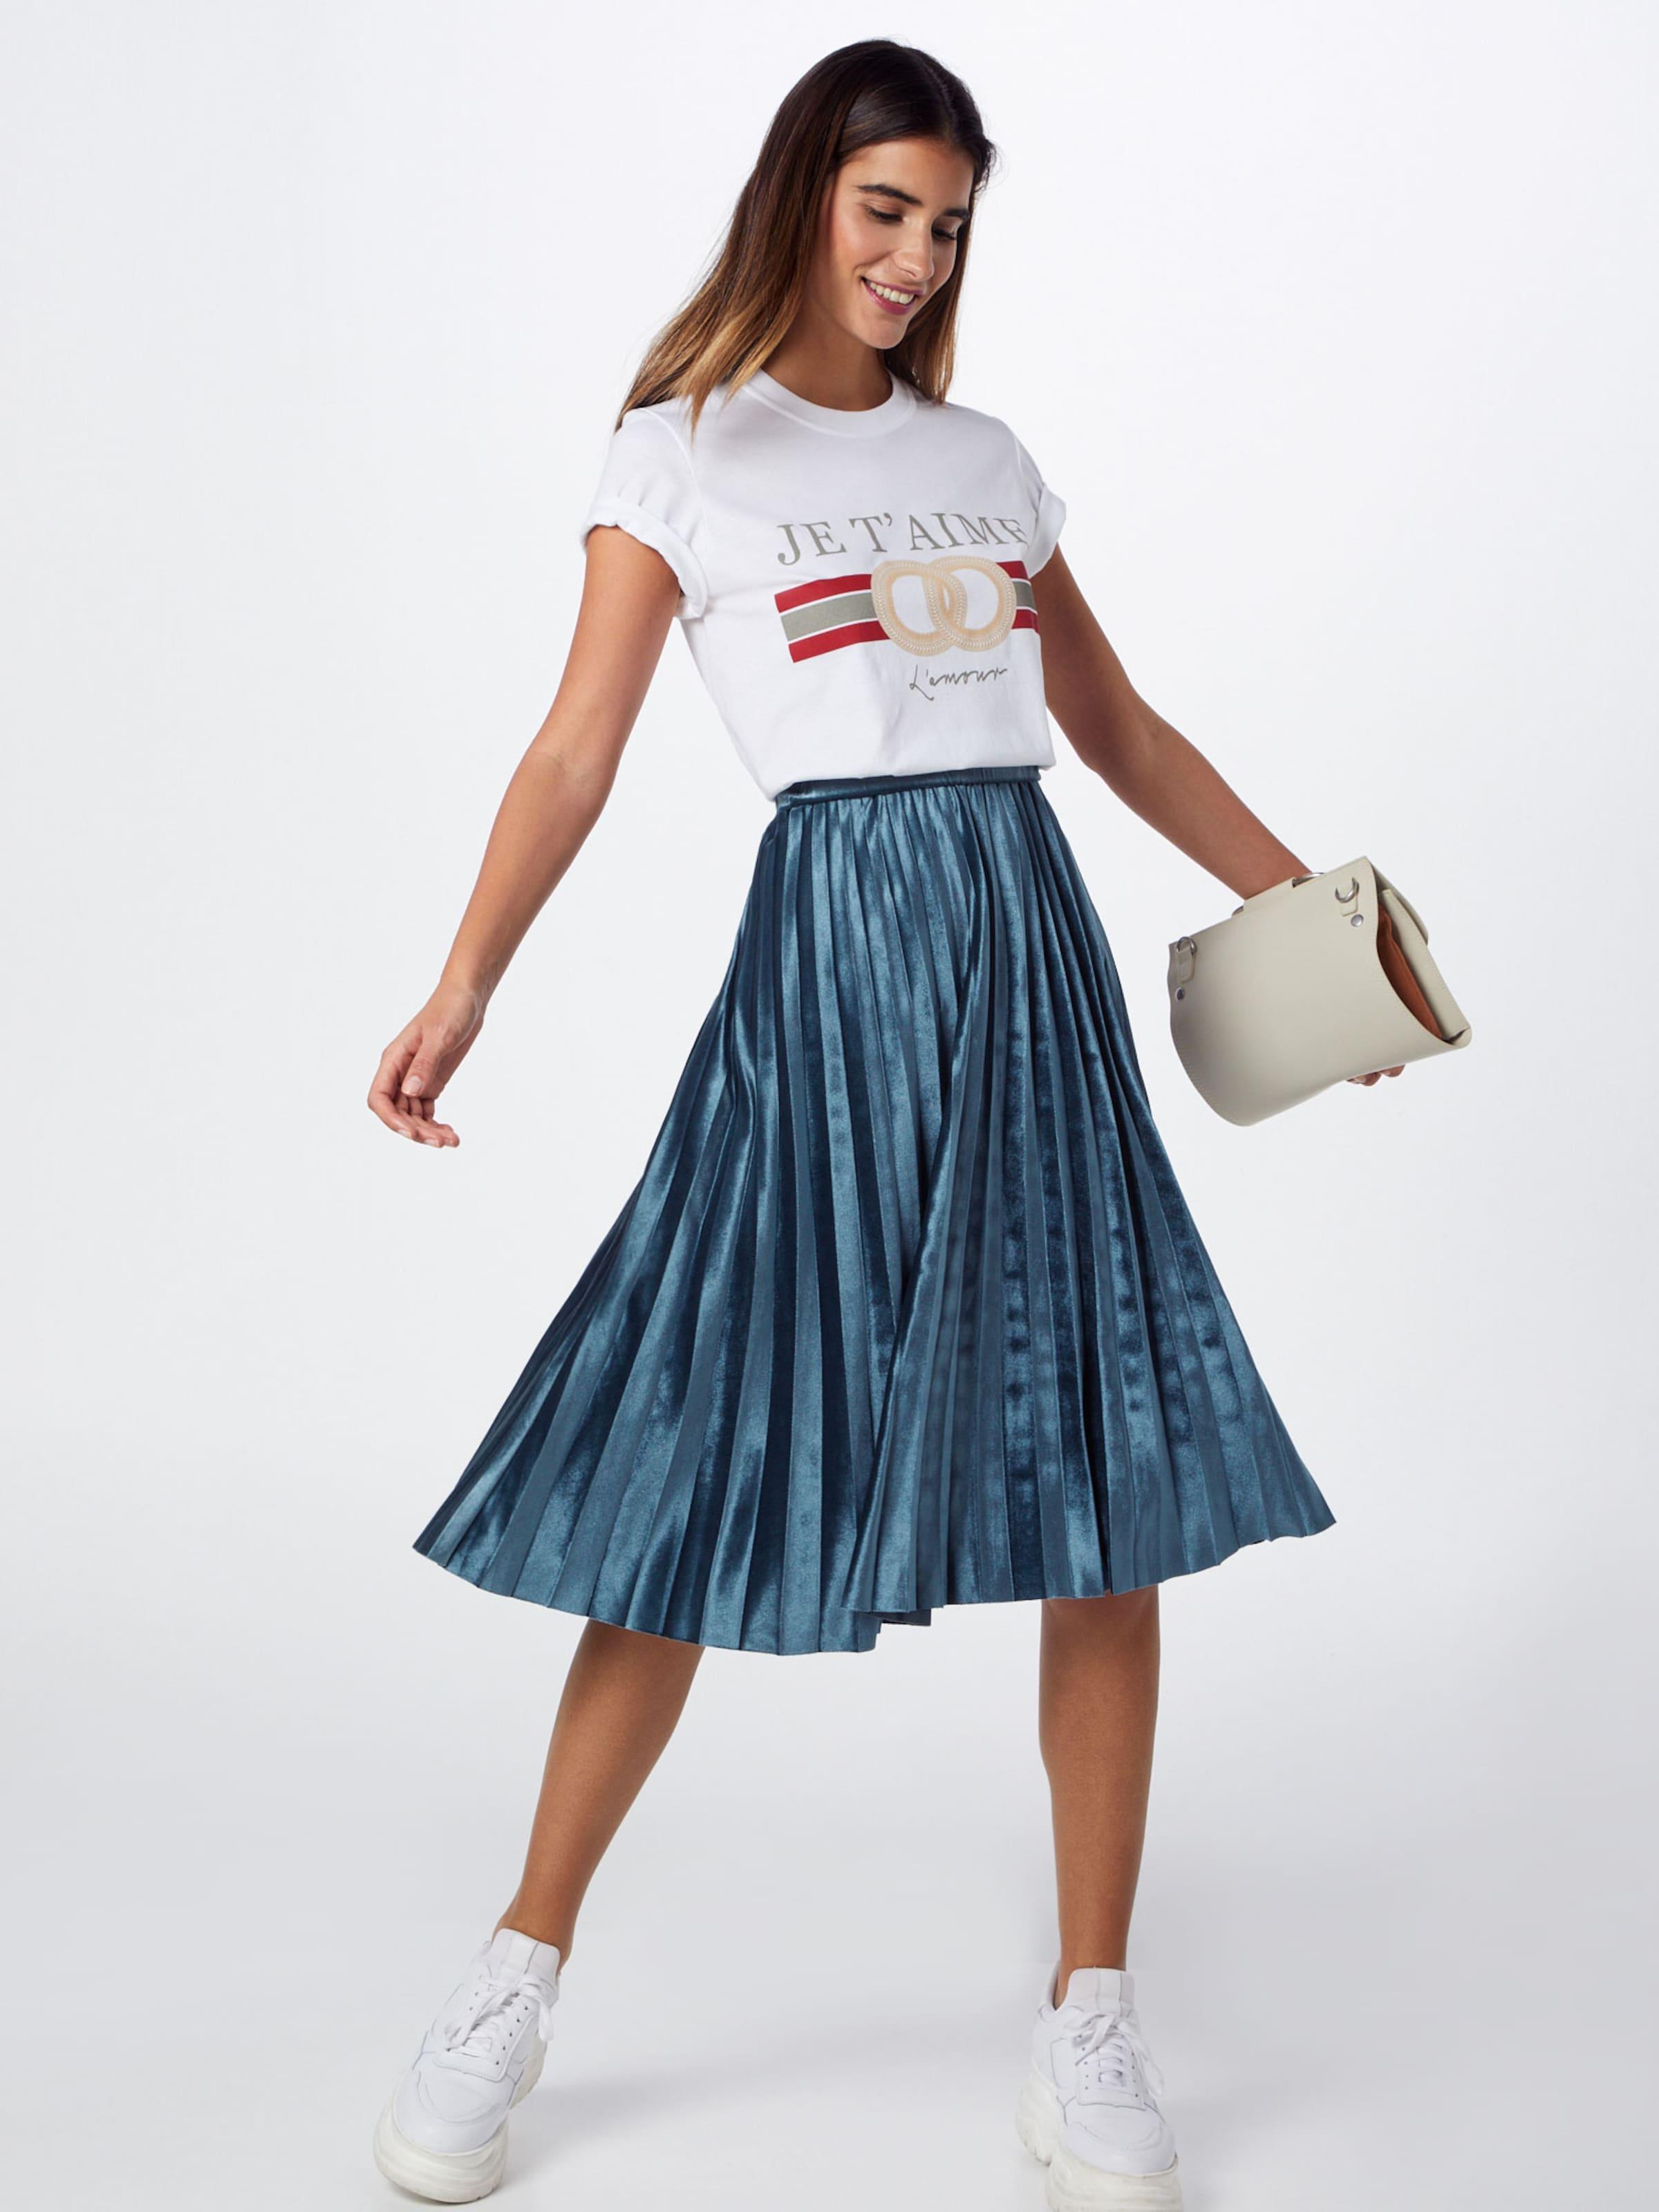 shirt Aime T 'je T Graphic Tshirt' Missguided Blanc En Oversized rCxshQtd